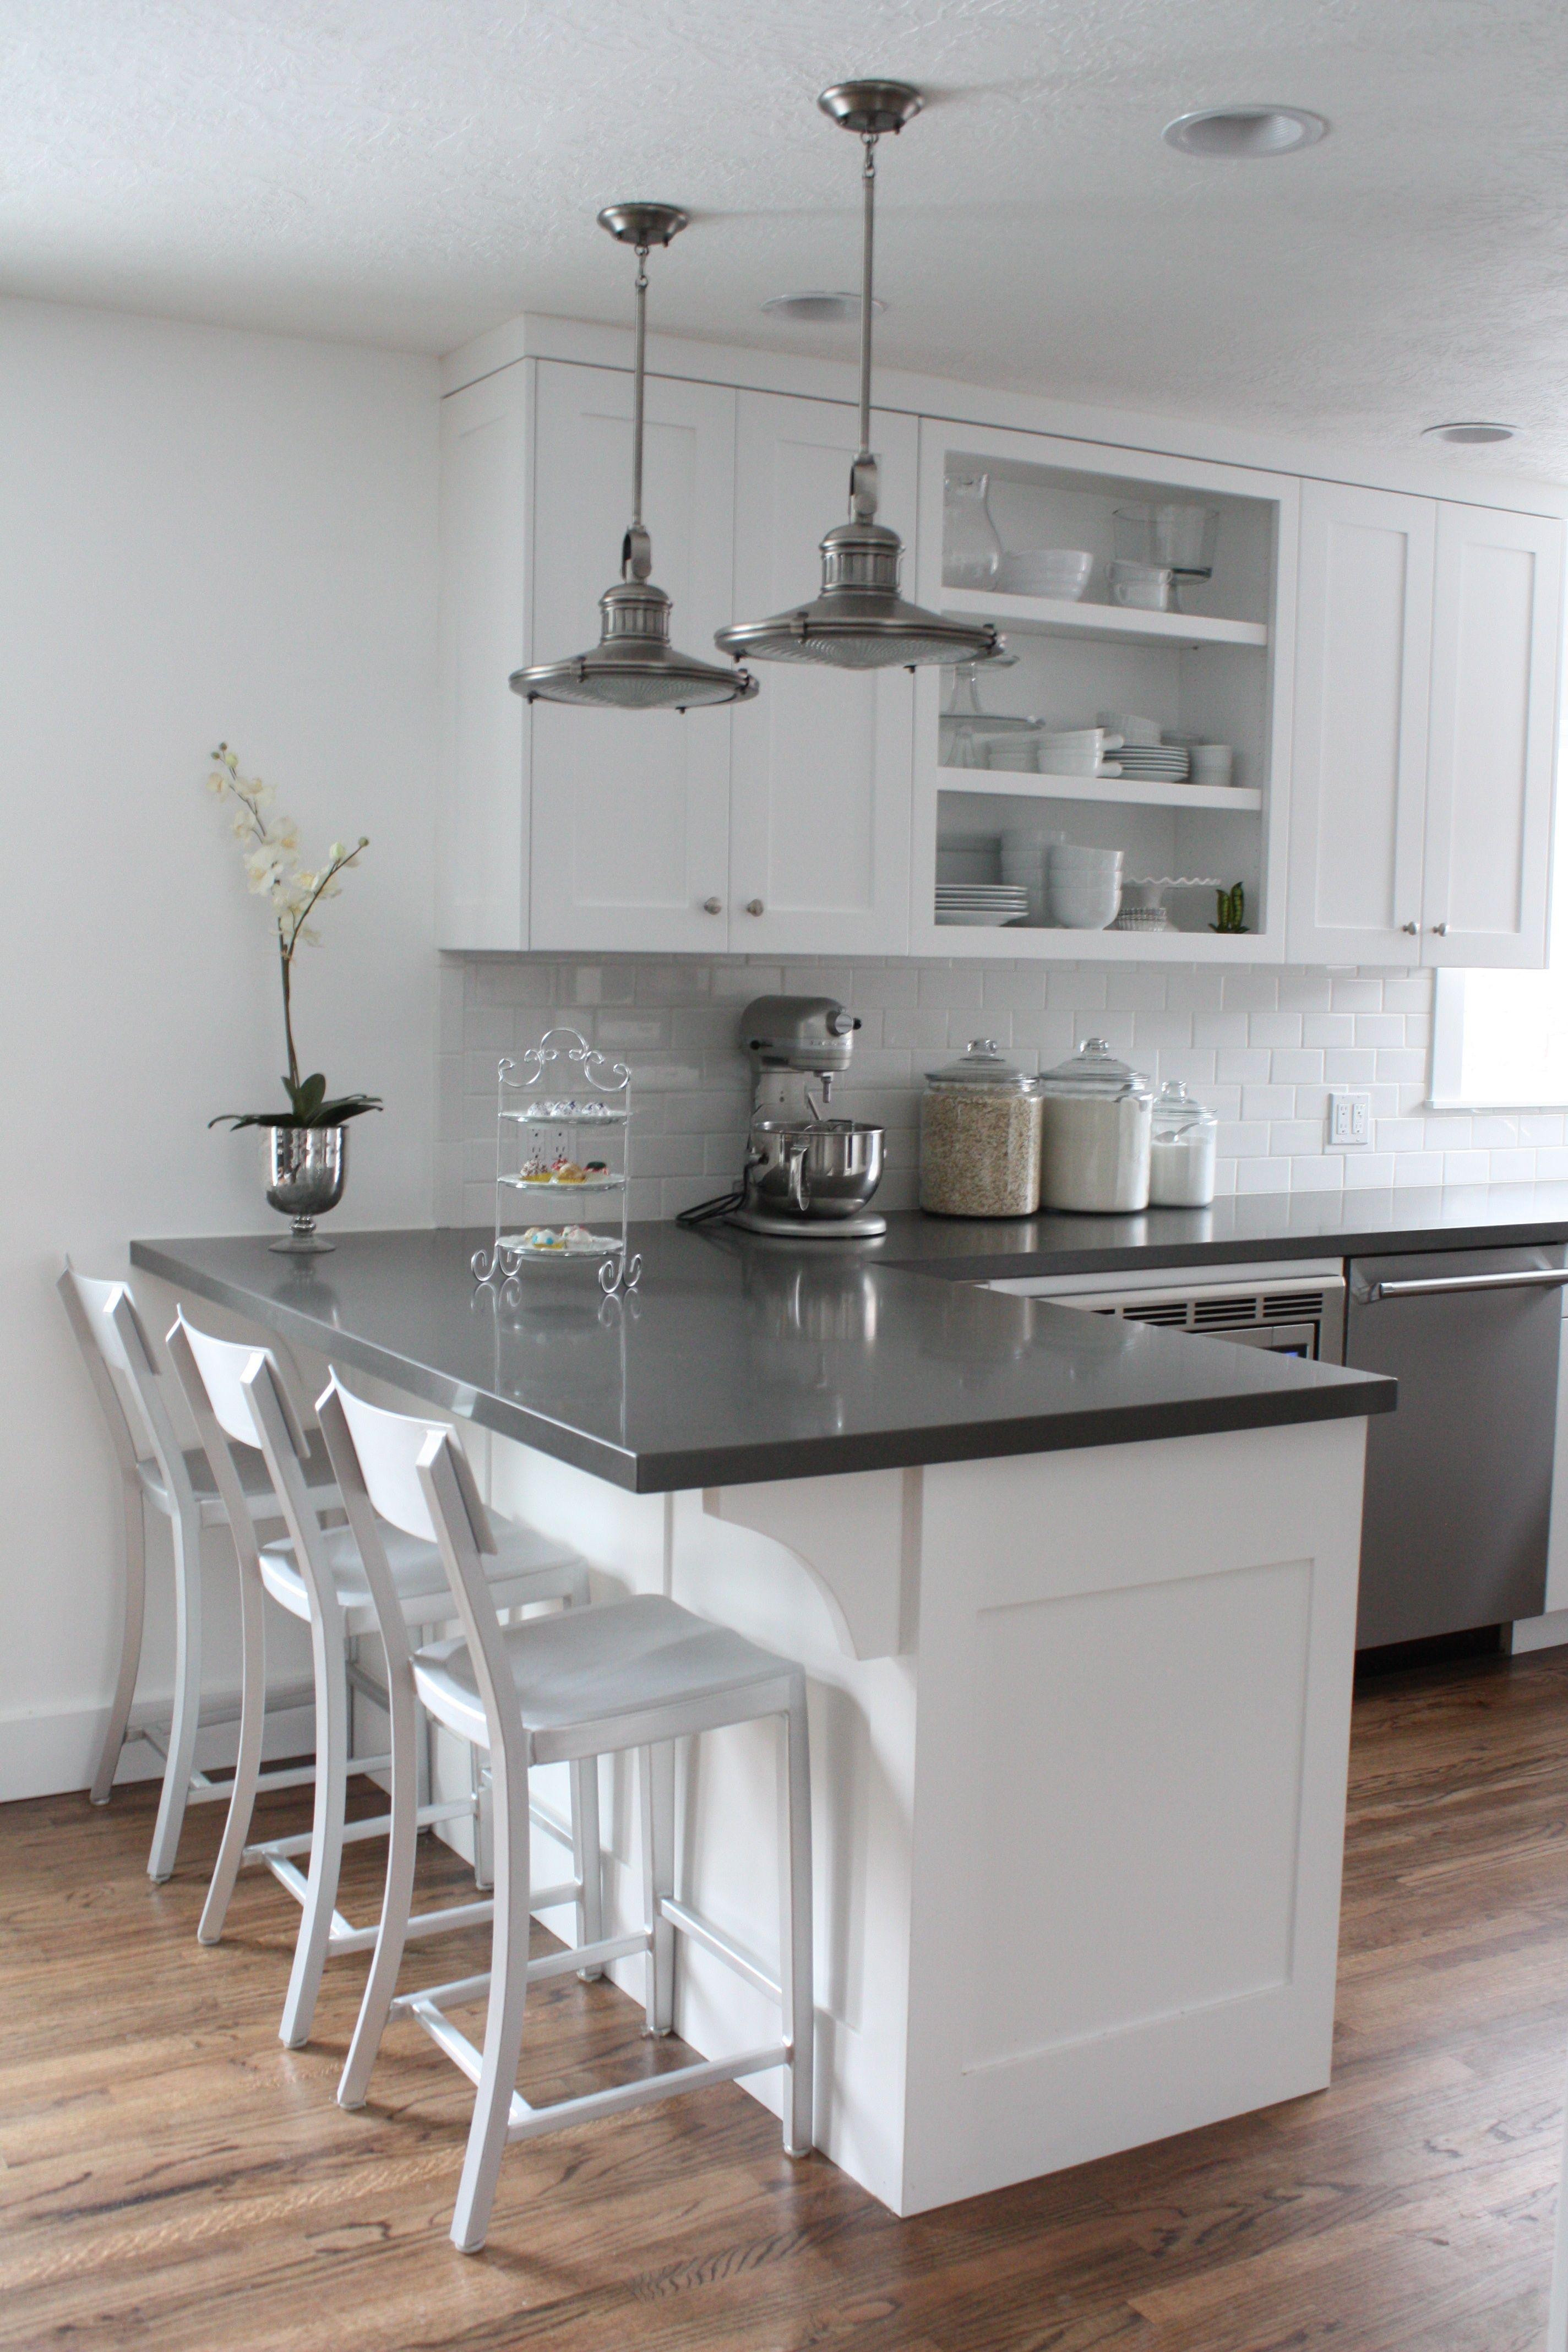 White cabinets, subway tile, quartz countertops